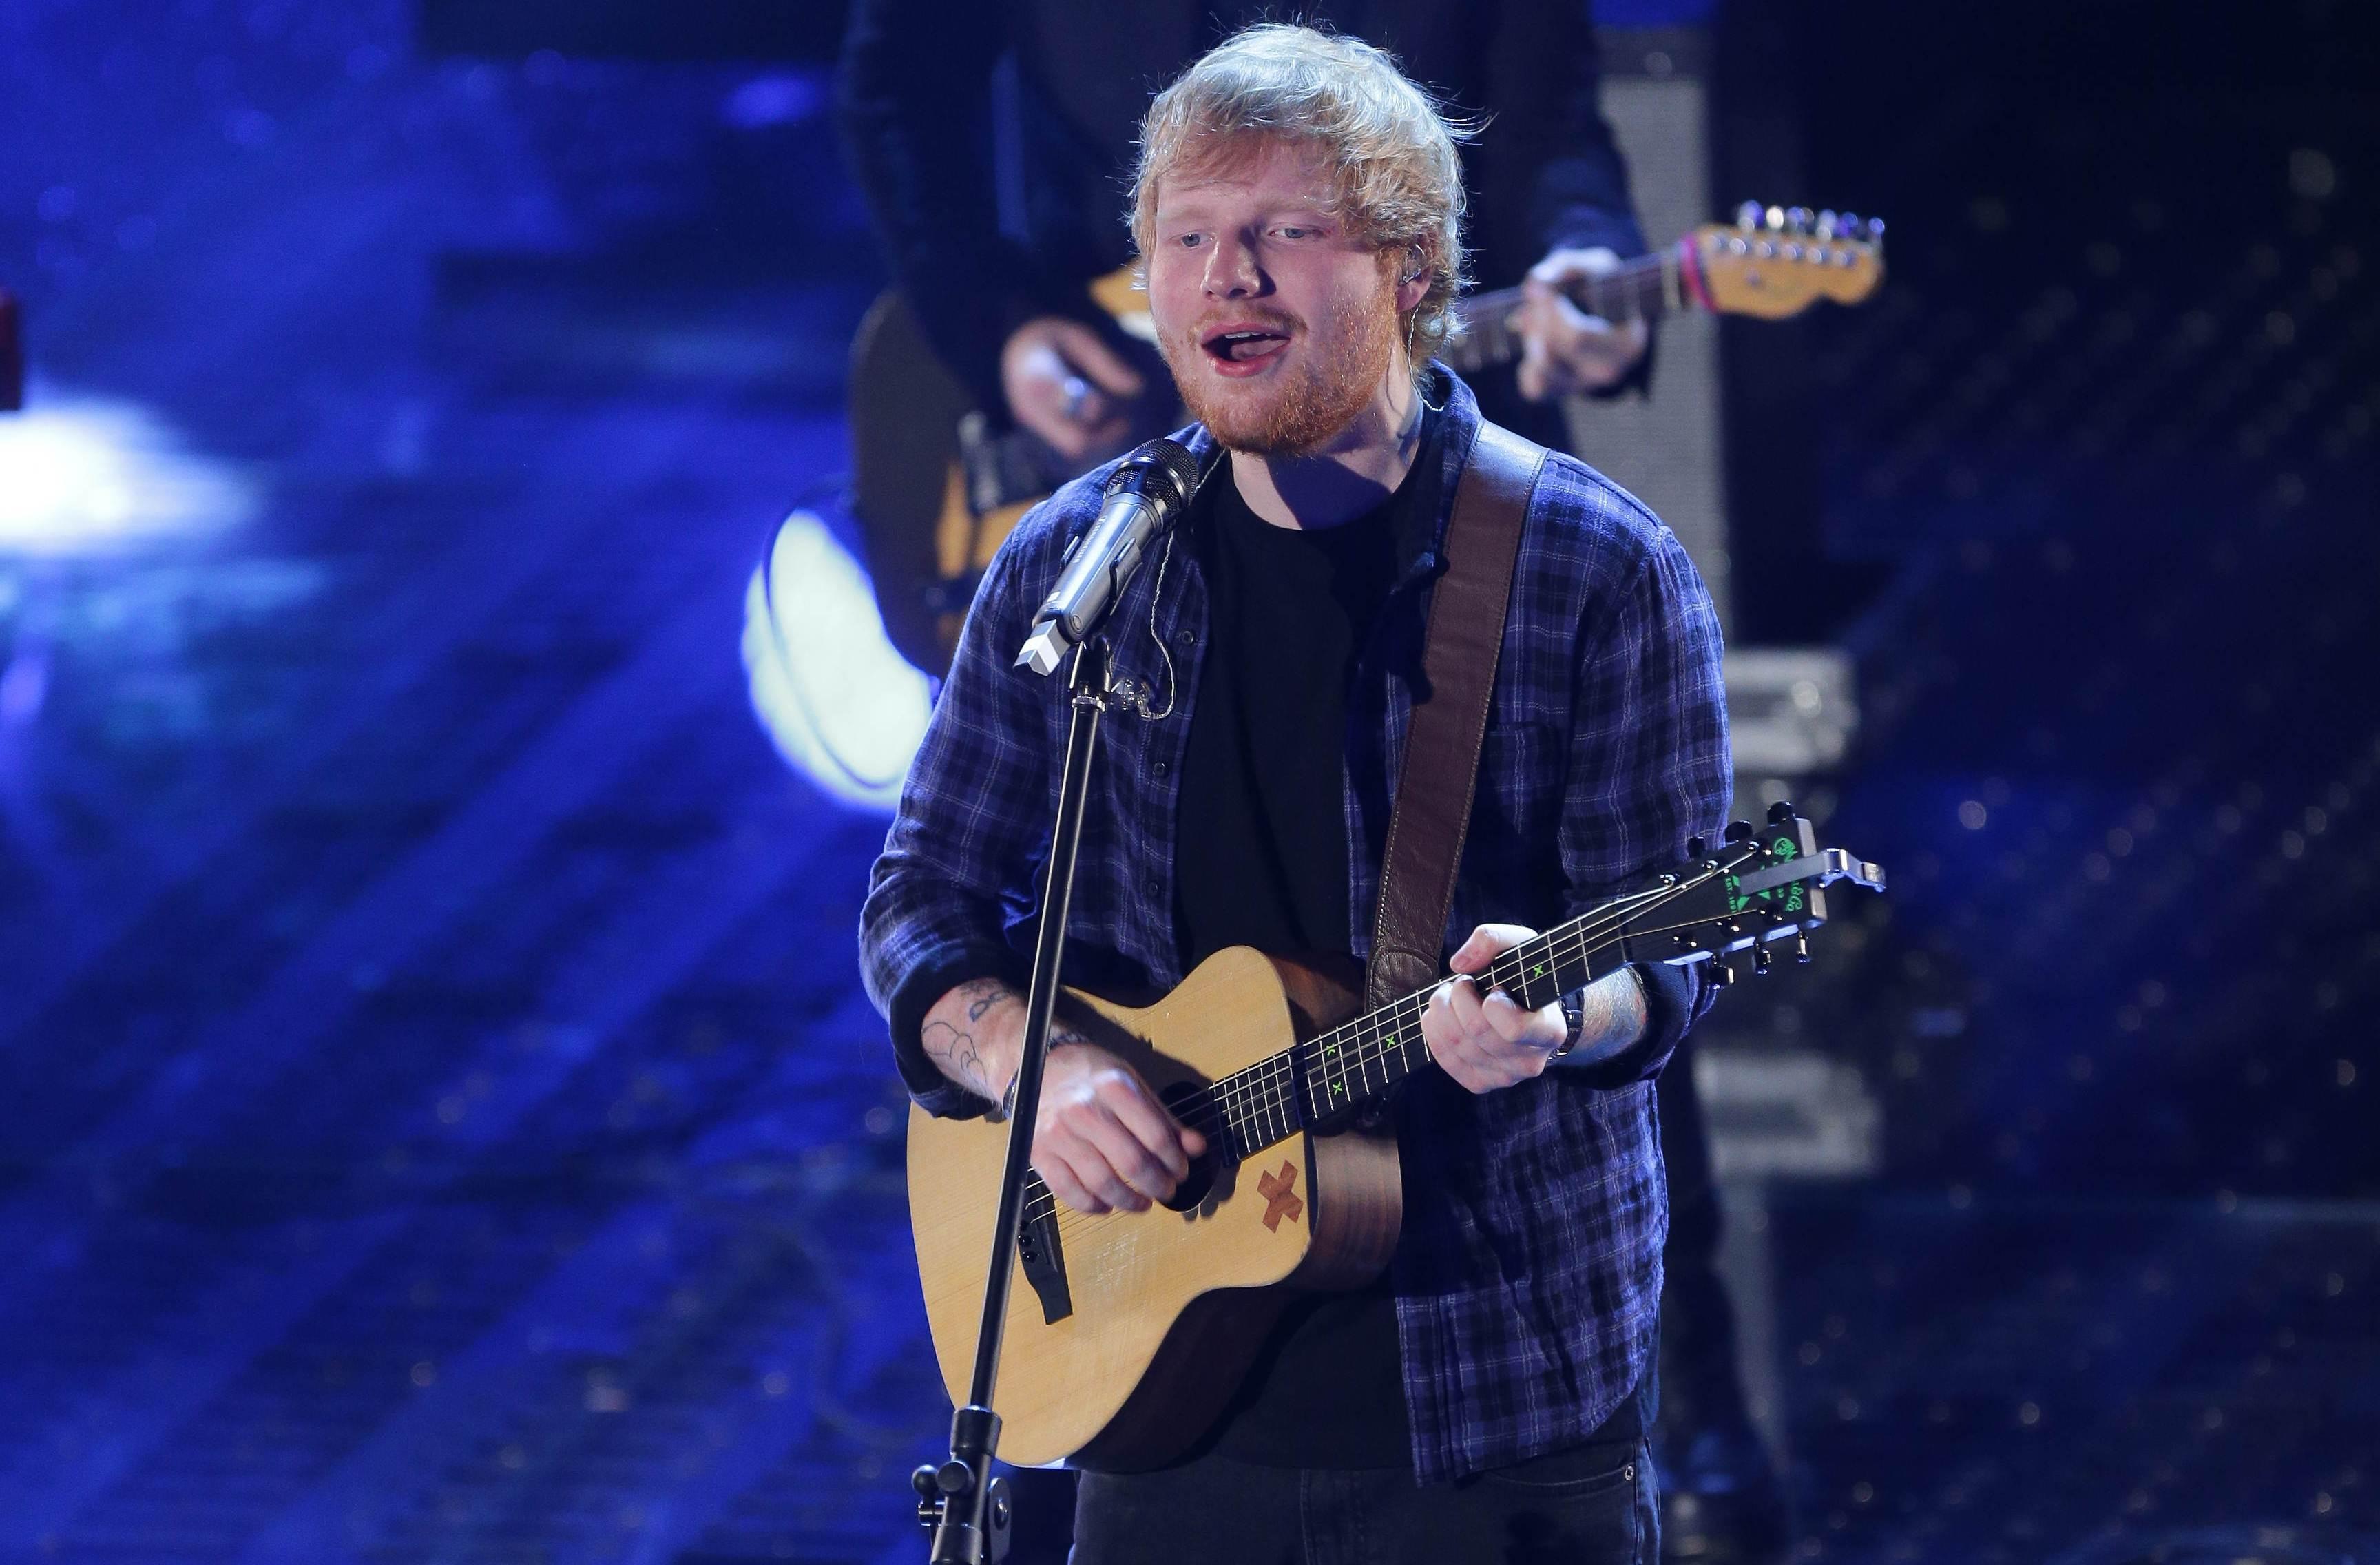 INF - Ed Sheeran at the Sanremo Festival